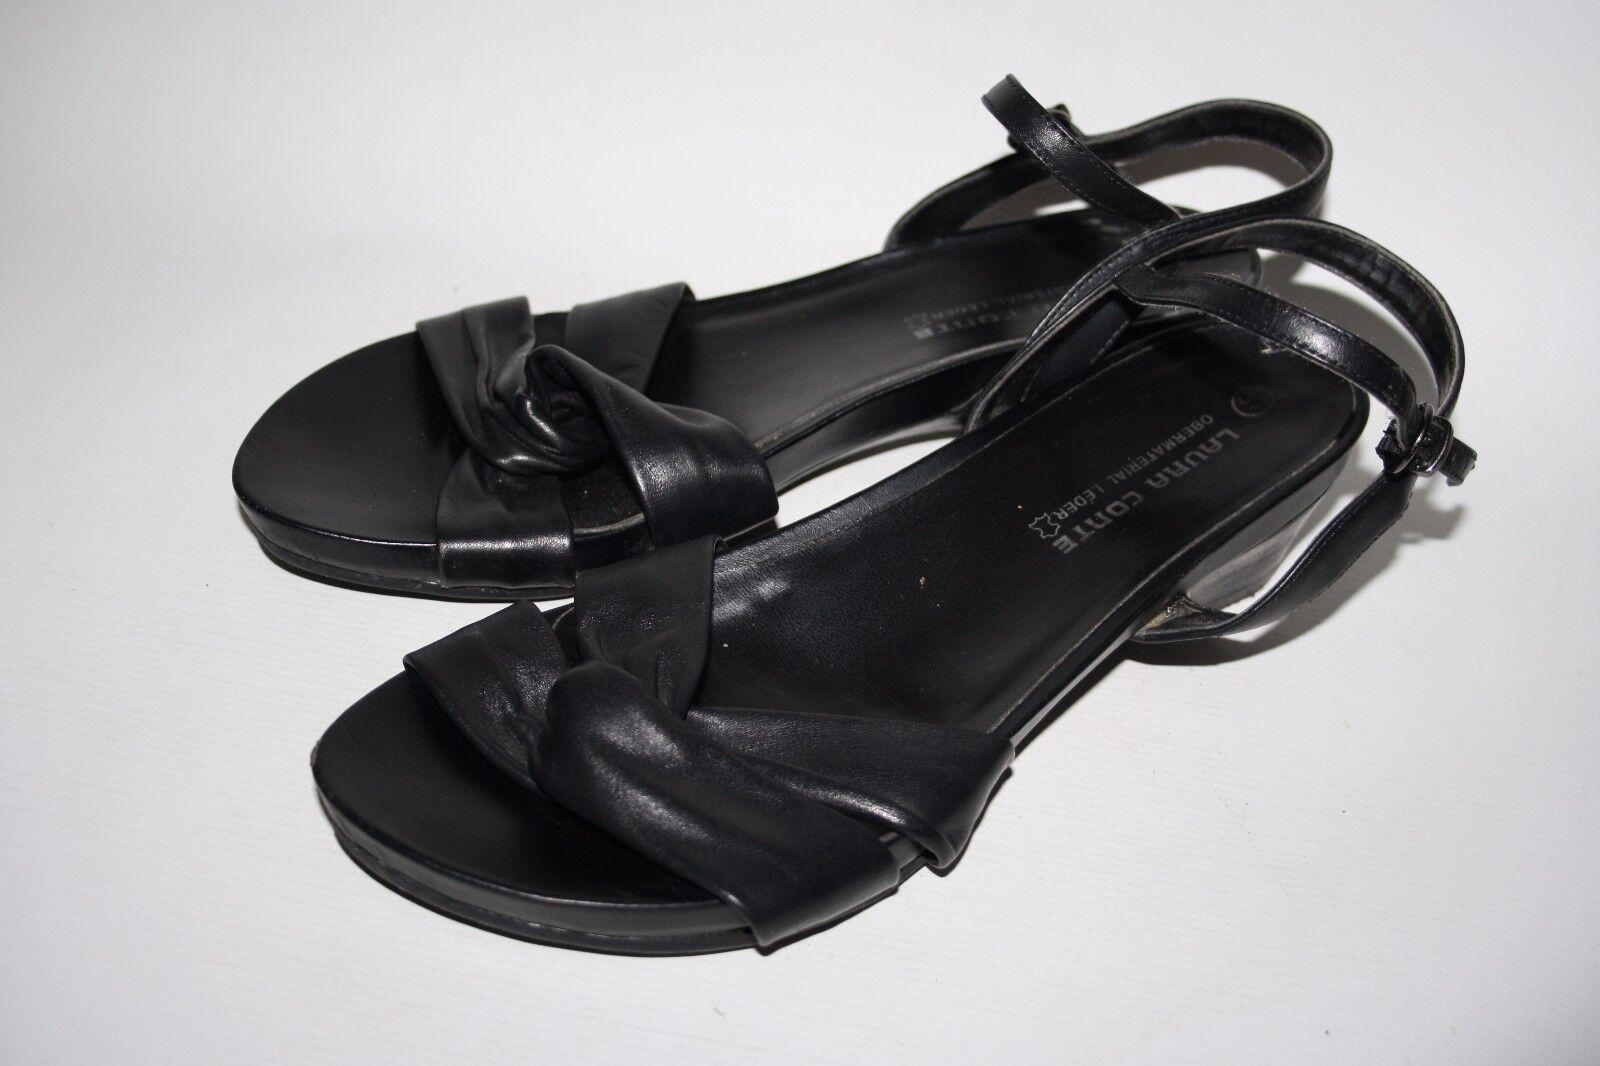 Laura Conte Black Fashion Designer Ladies Woman's Sandals Shoes Black Conte Leather 4 UK f80fed